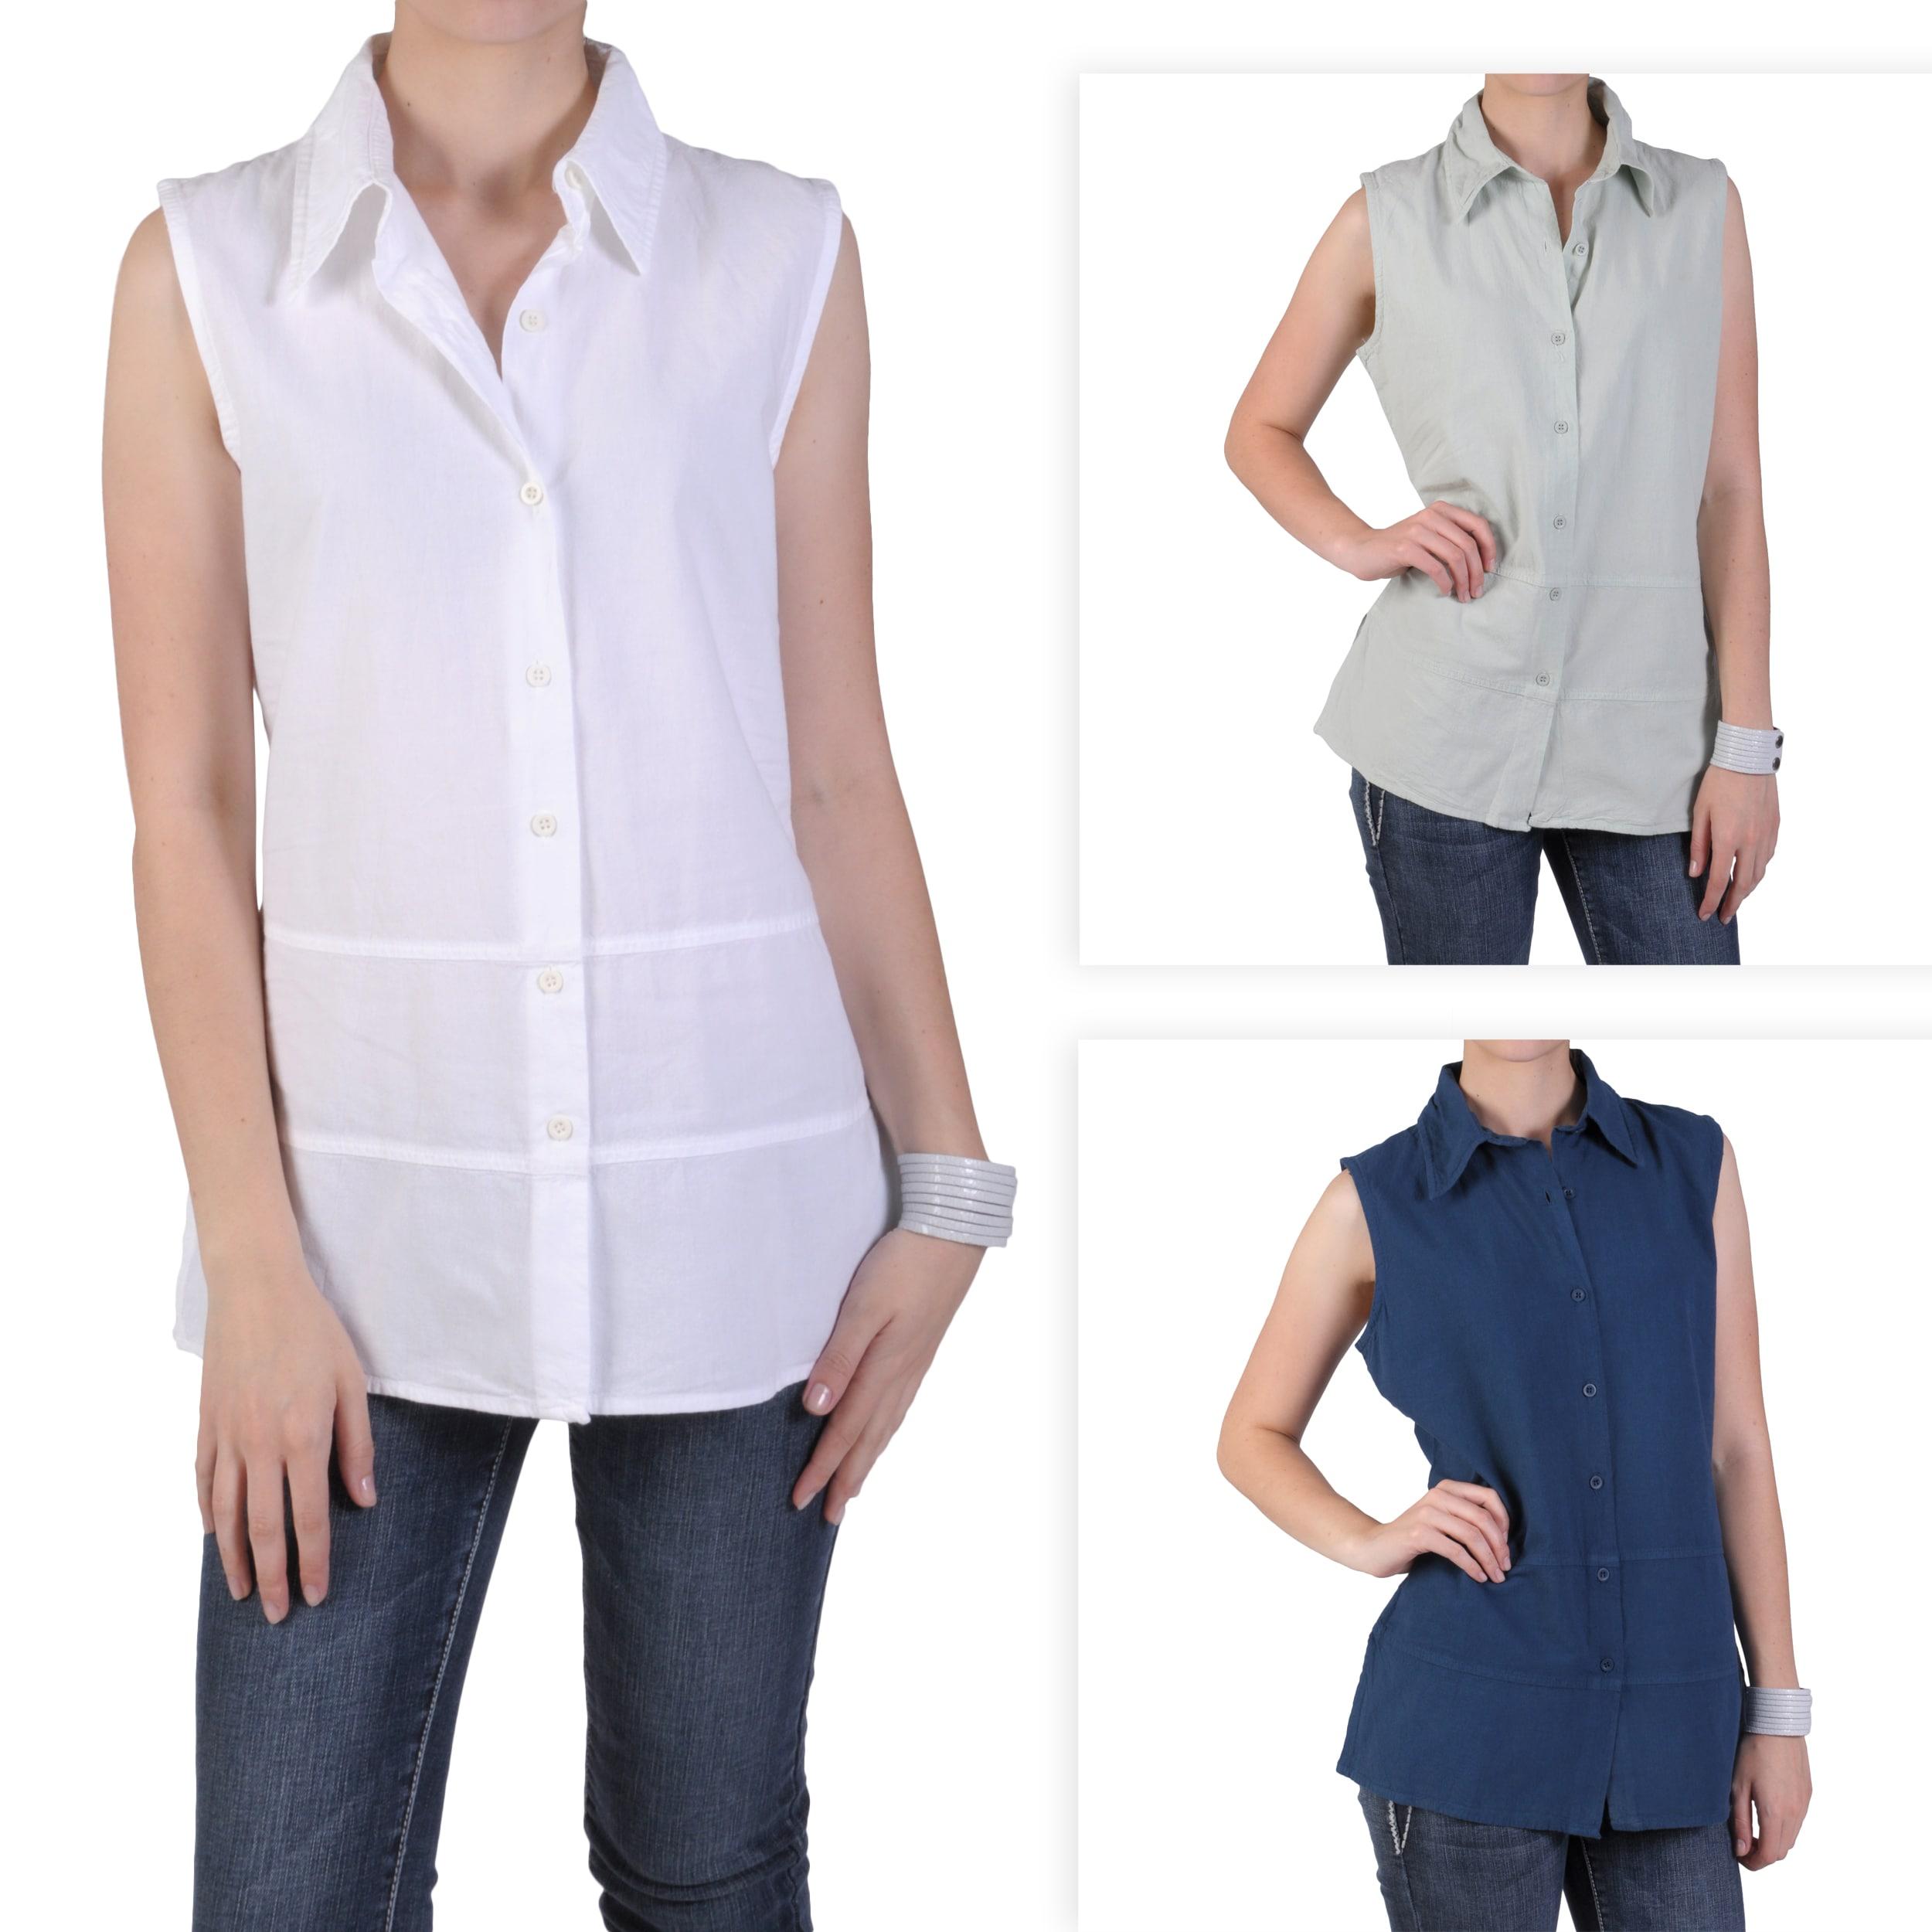 Tressa Designs Women's Pointed Collar Button-up Top